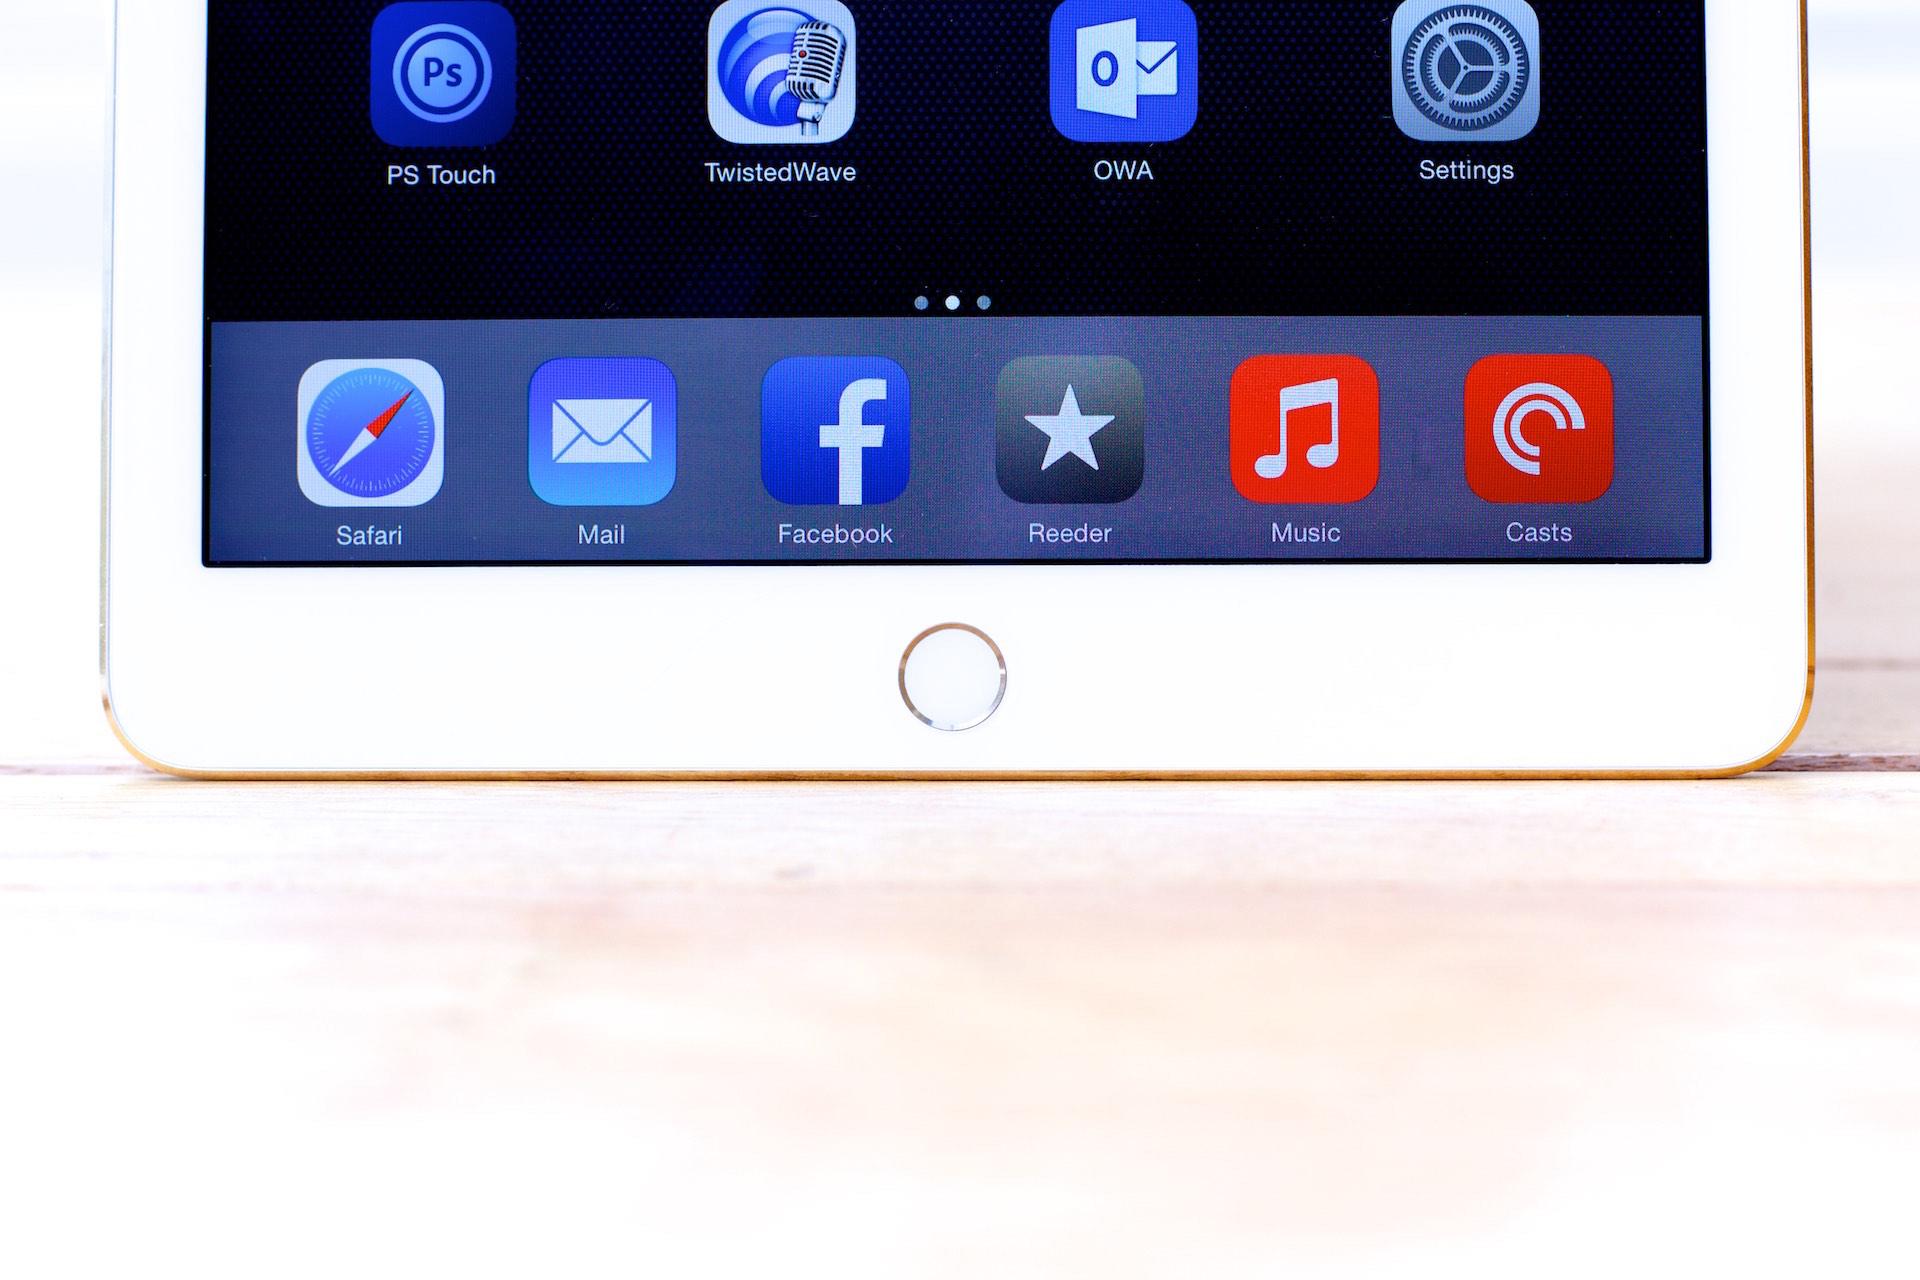 apple-ipad-air-2-review 6.jpg